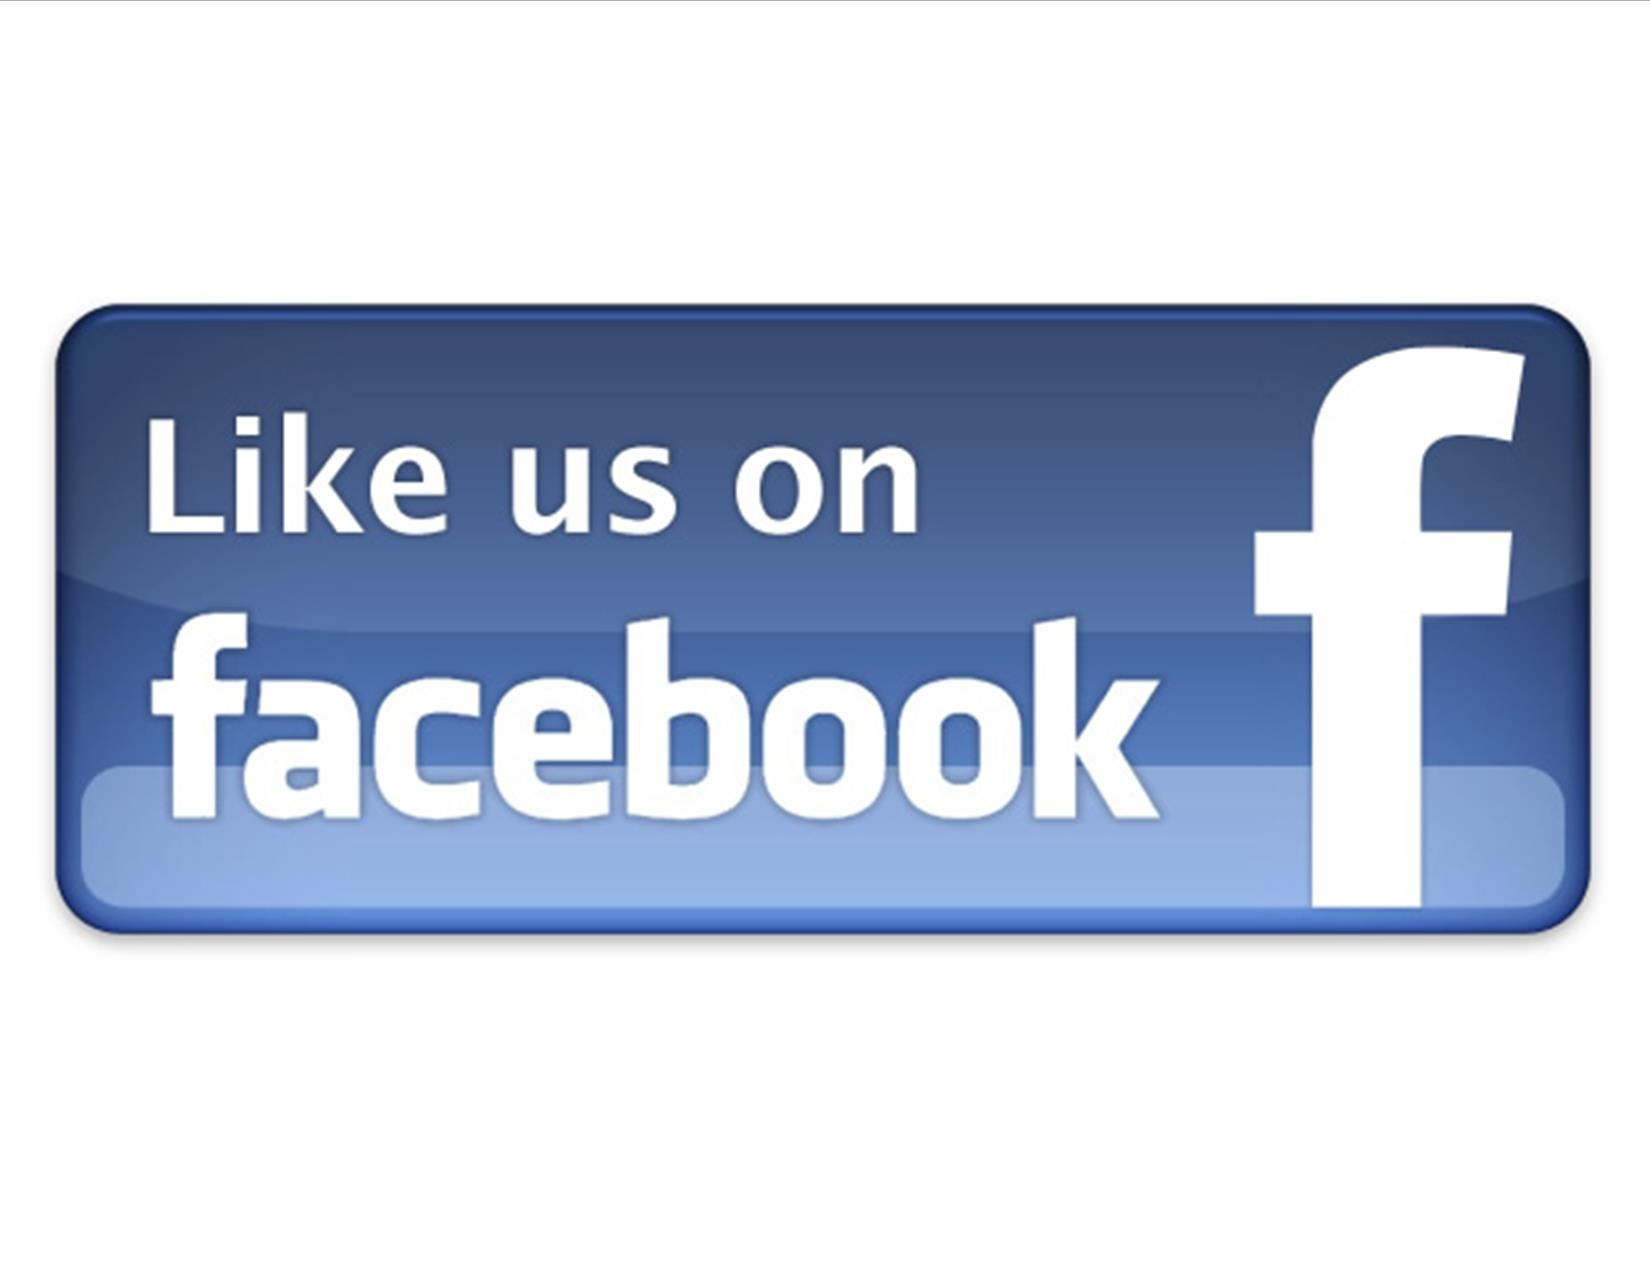 Facebook like logo clipart jpg transparent Facebook Like Vector Like Us On Facebook Logo #HZ1EmM - Clipart Kid jpg transparent